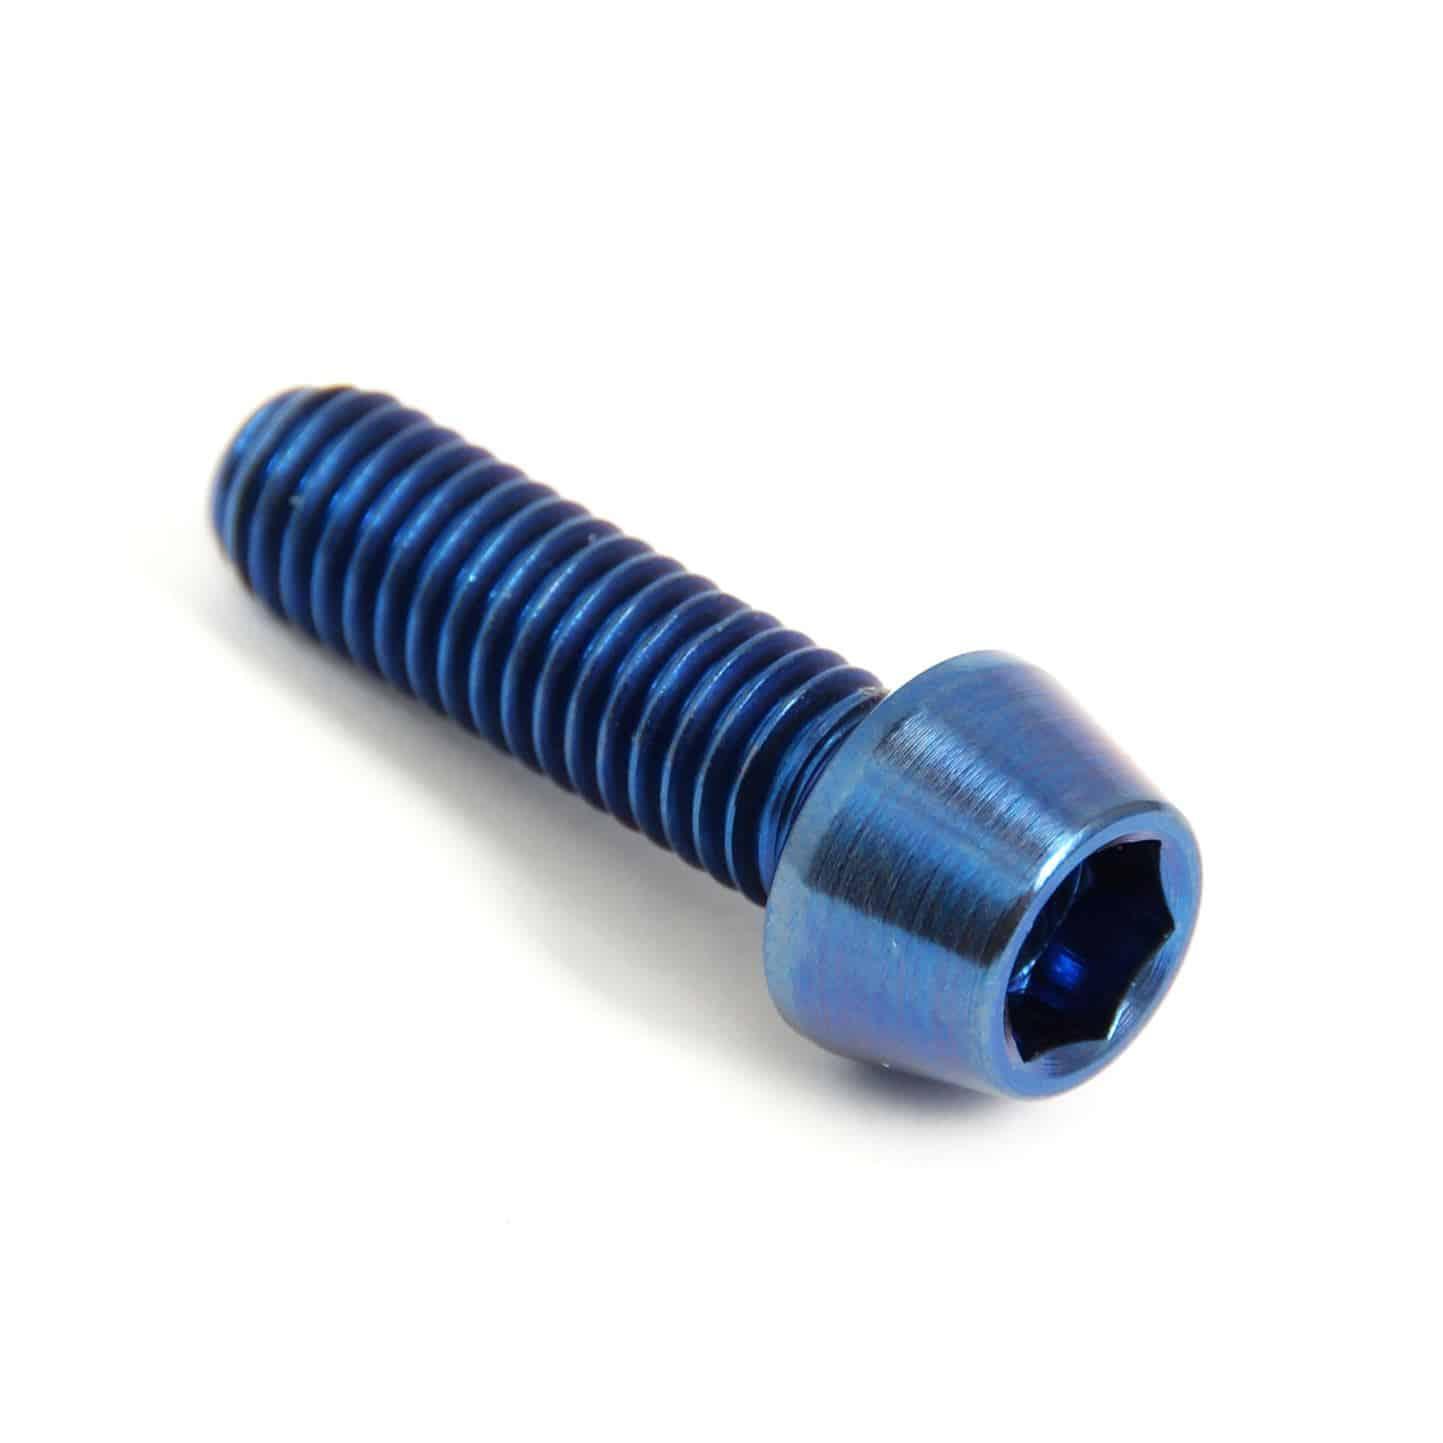 Avid Hayes Blue Titanium Caliper Bolts M6x15mm 4 Pack Fit Hope